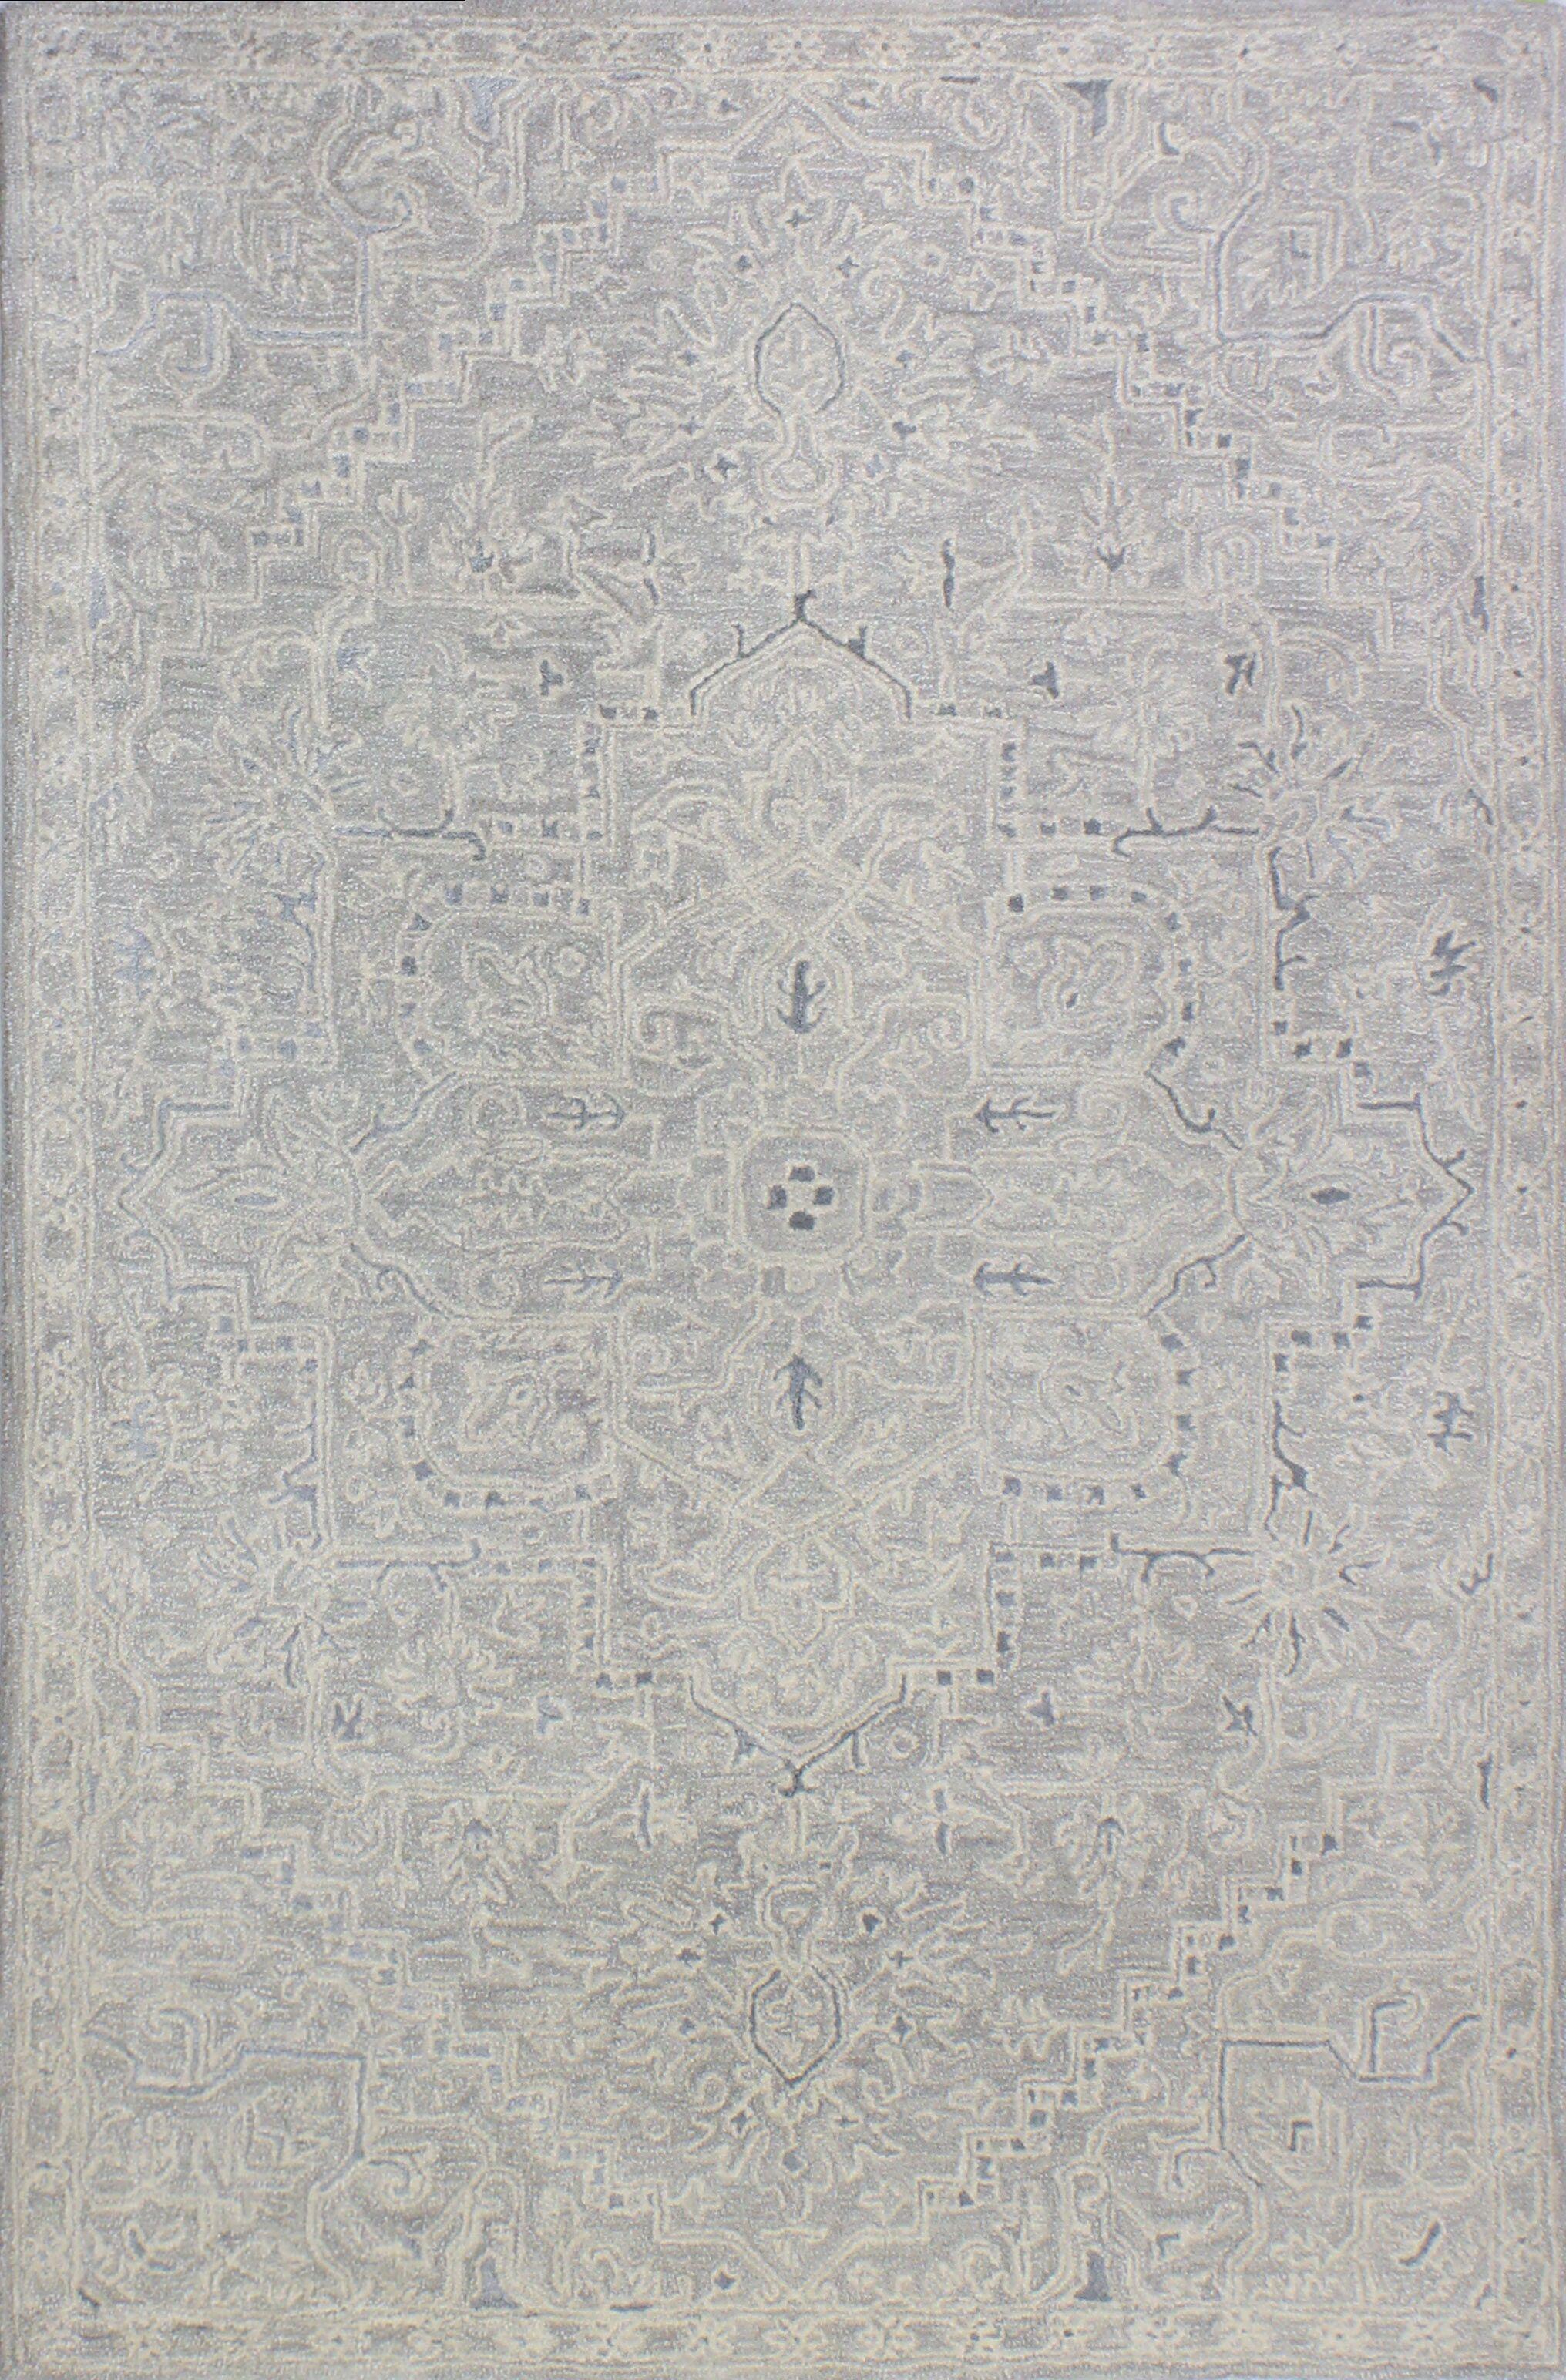 Kinman Hand-Woven Silver Area Rug Rug Size: Rectangle 8'6